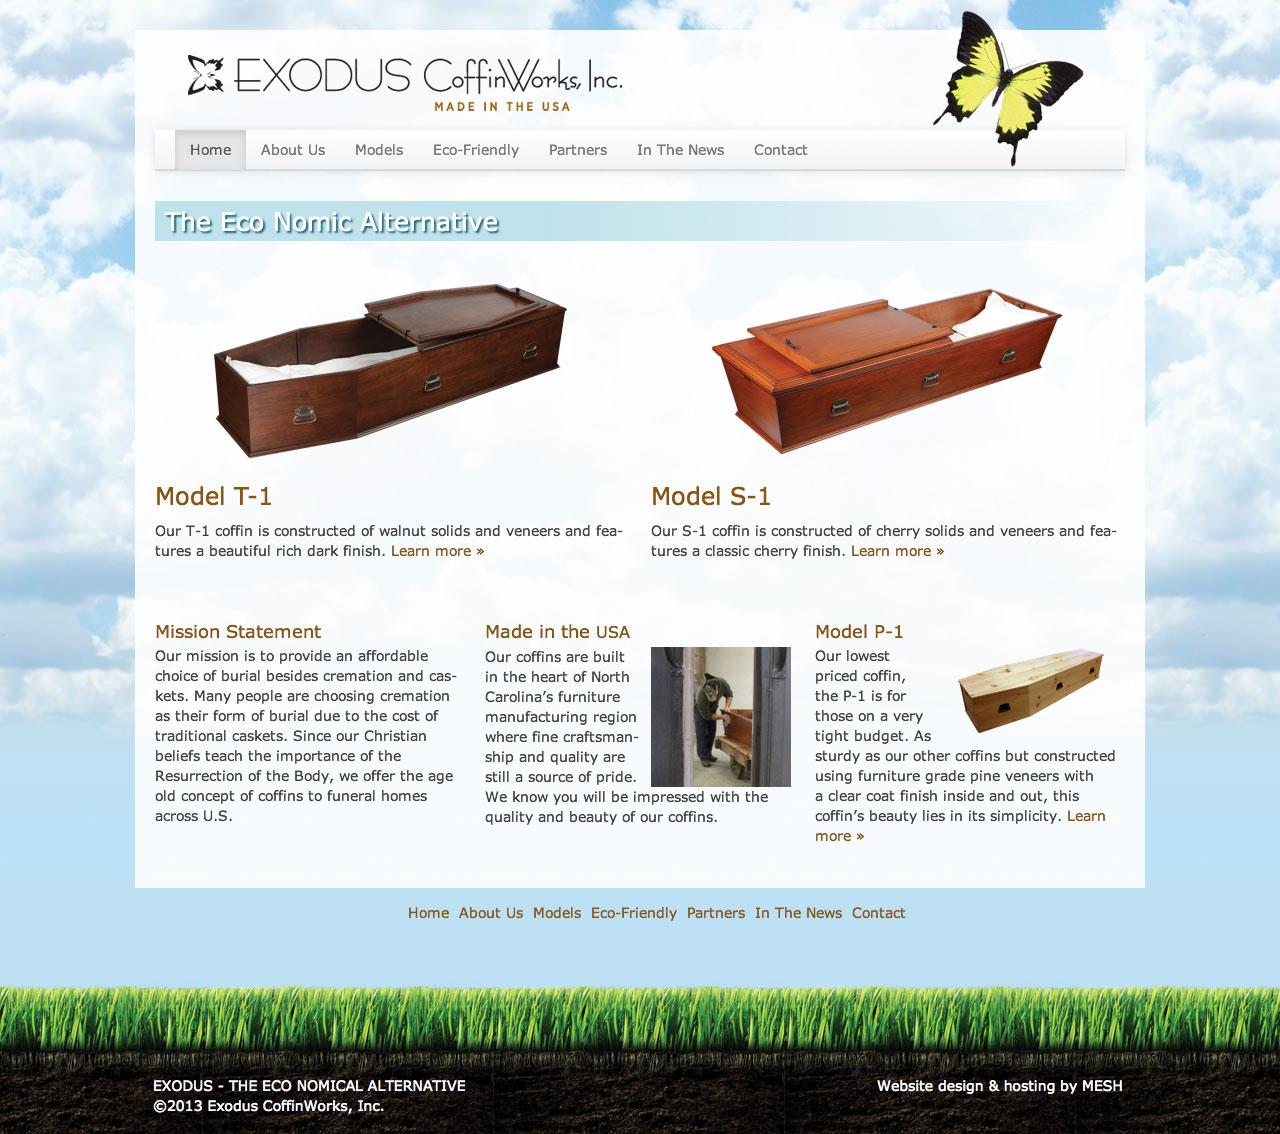 Website design for Exodus CoffinWorks, Inc.